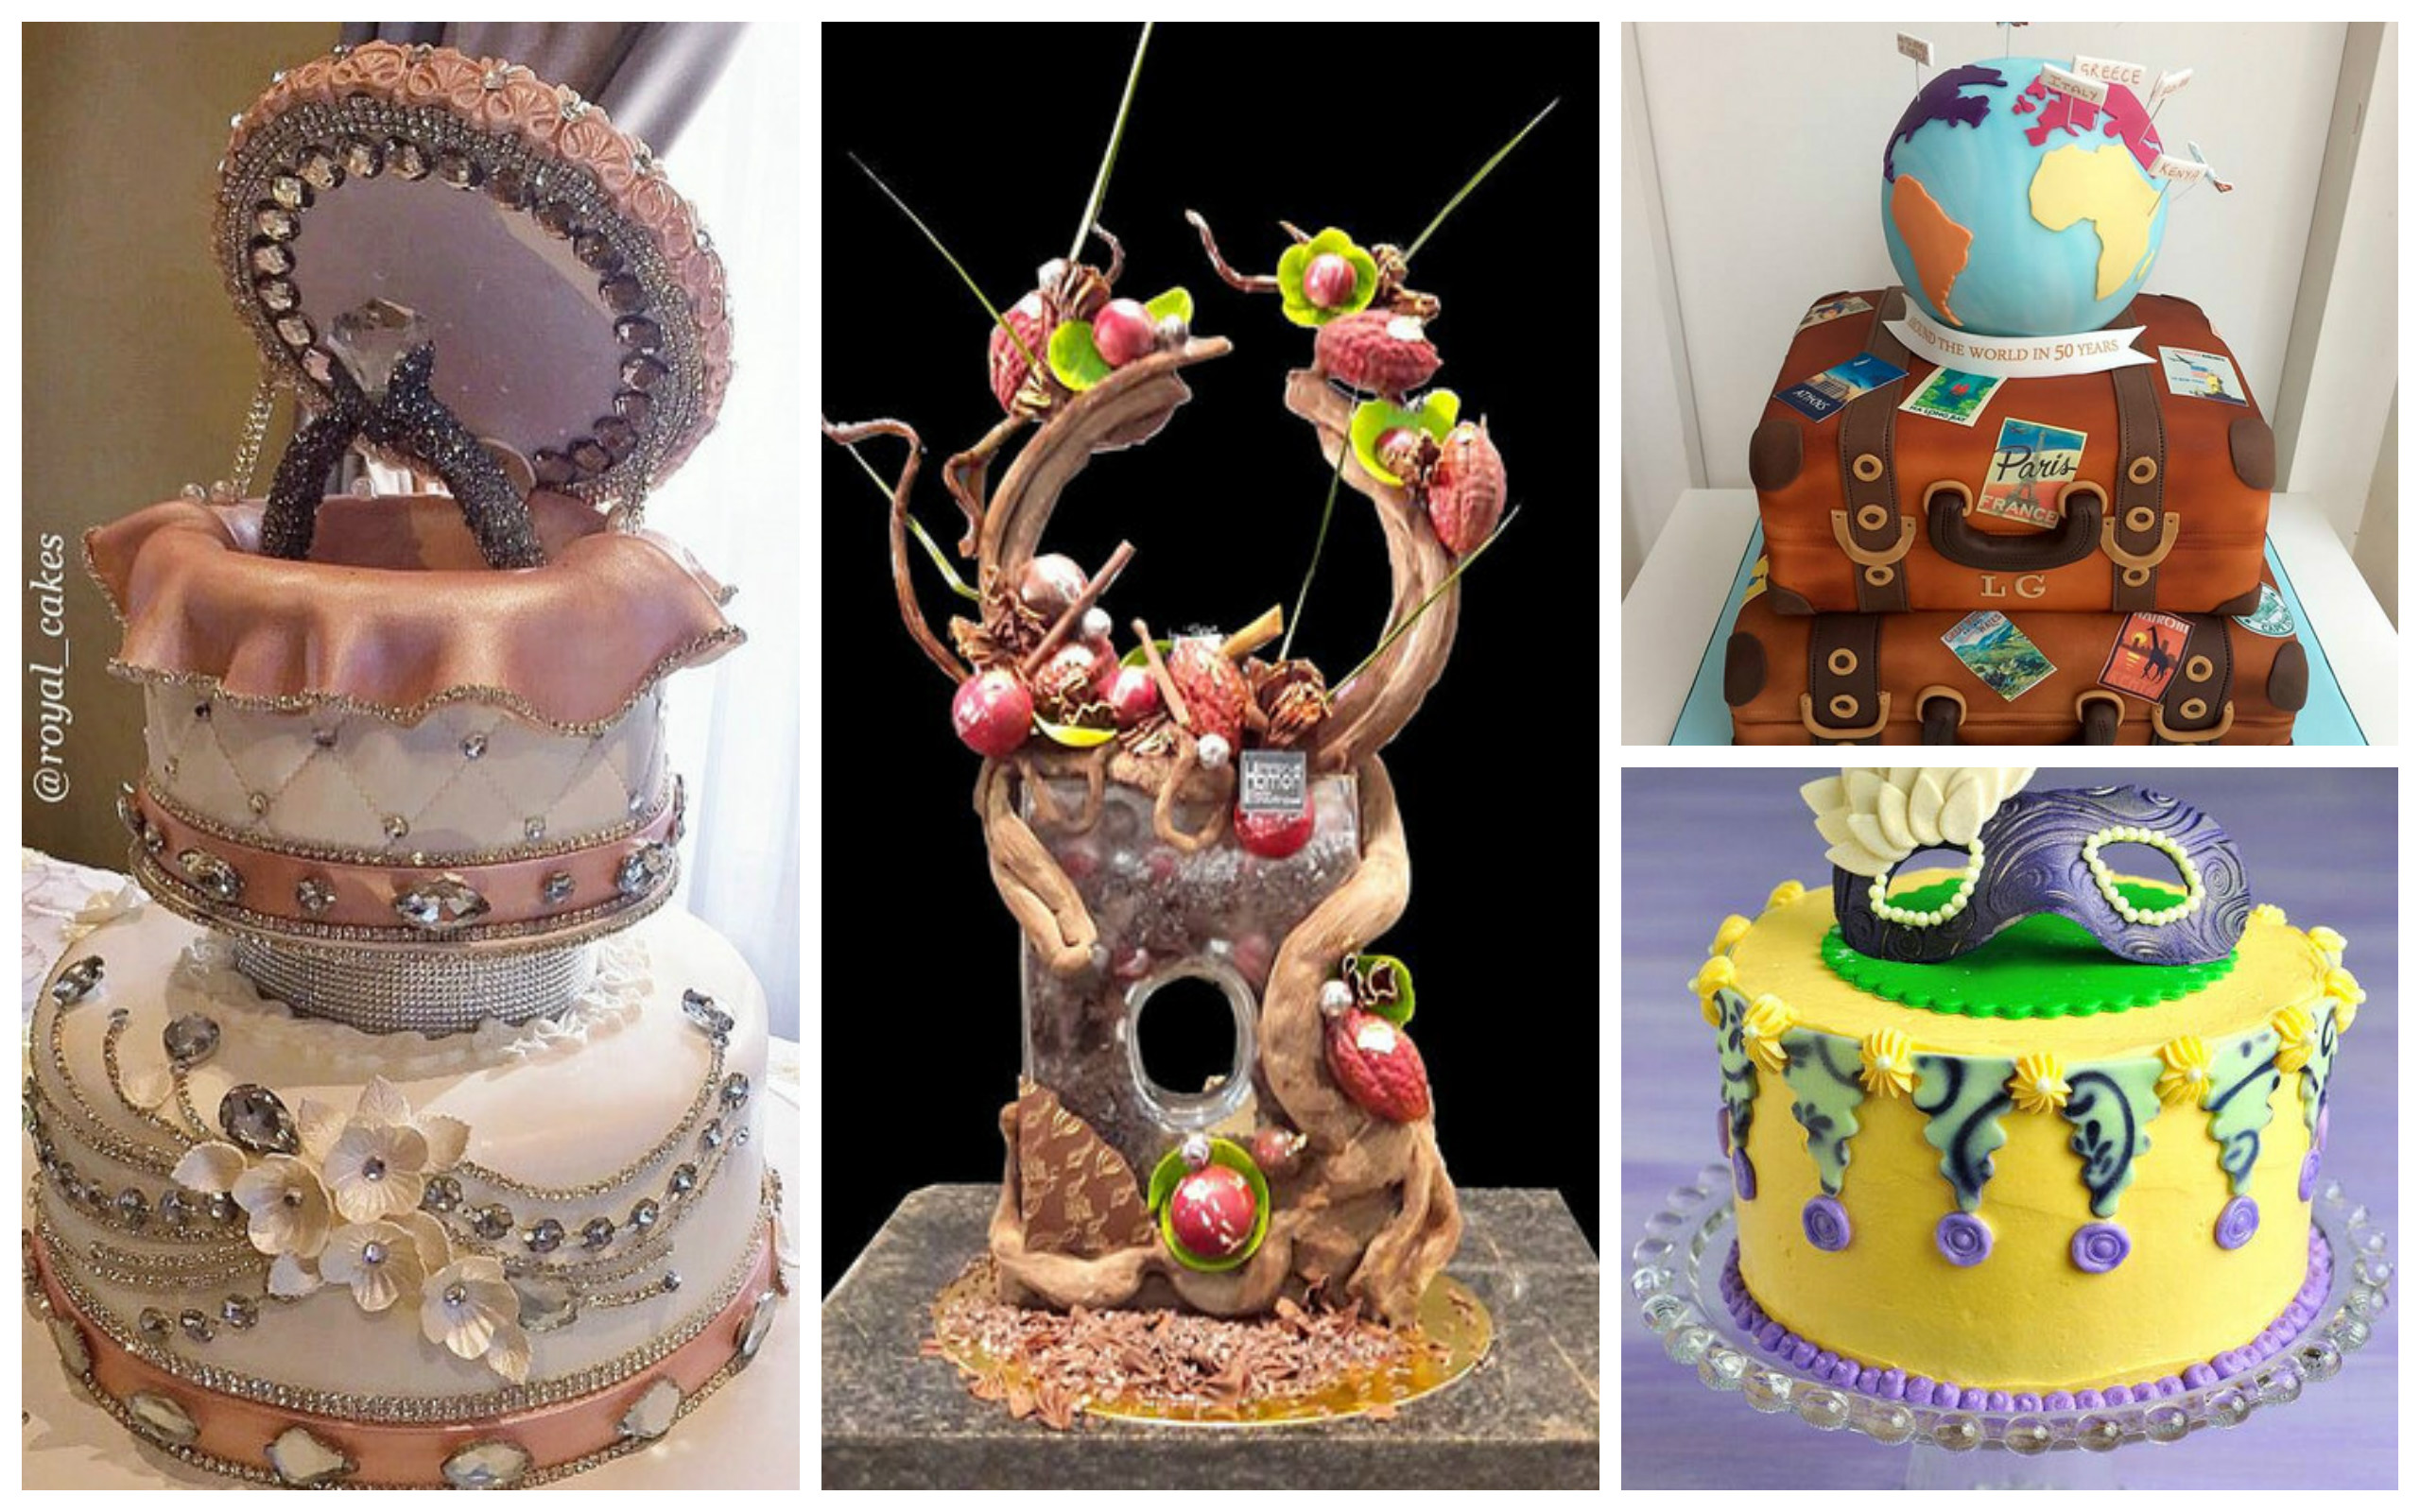 Competition Worlds Genuine Cake Designer